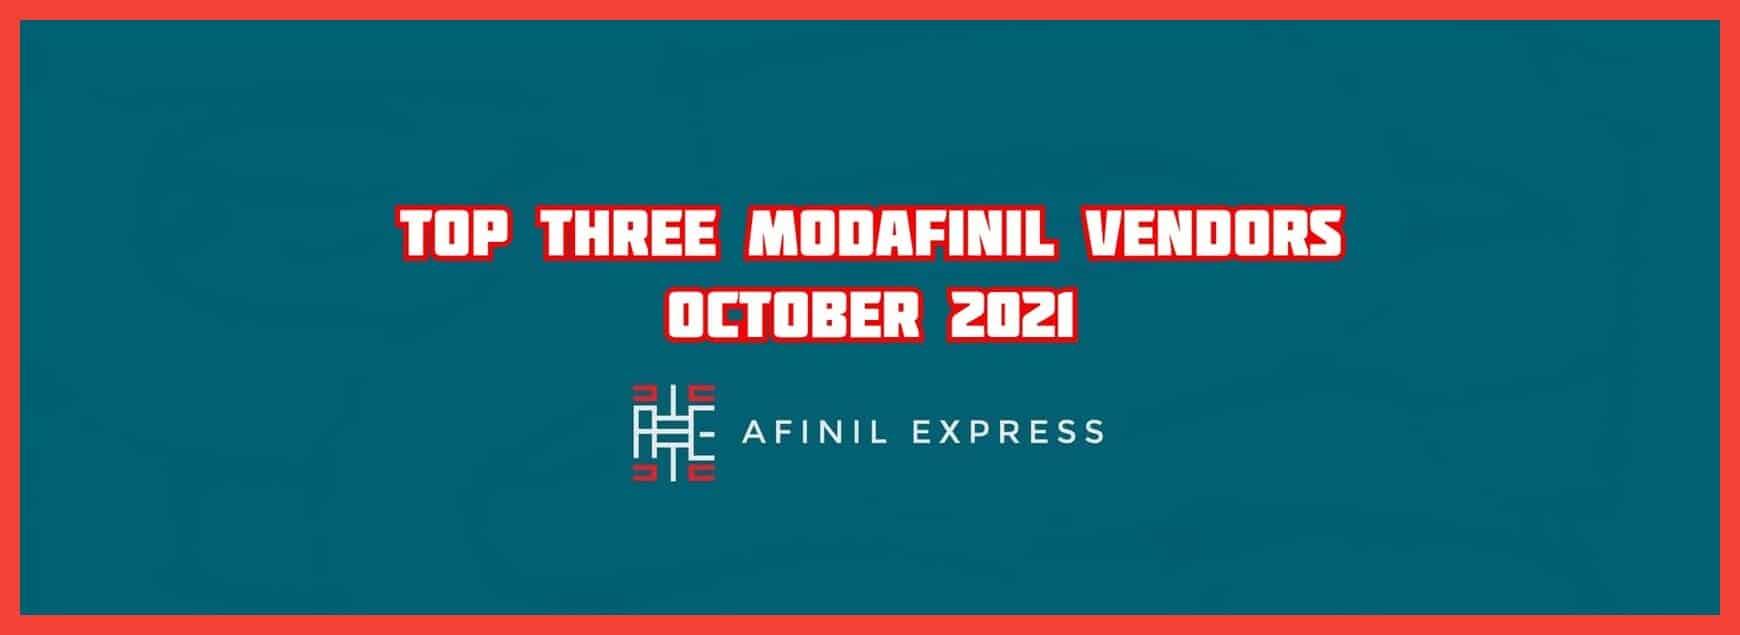 Top 3 Modafinil vendors October 2021